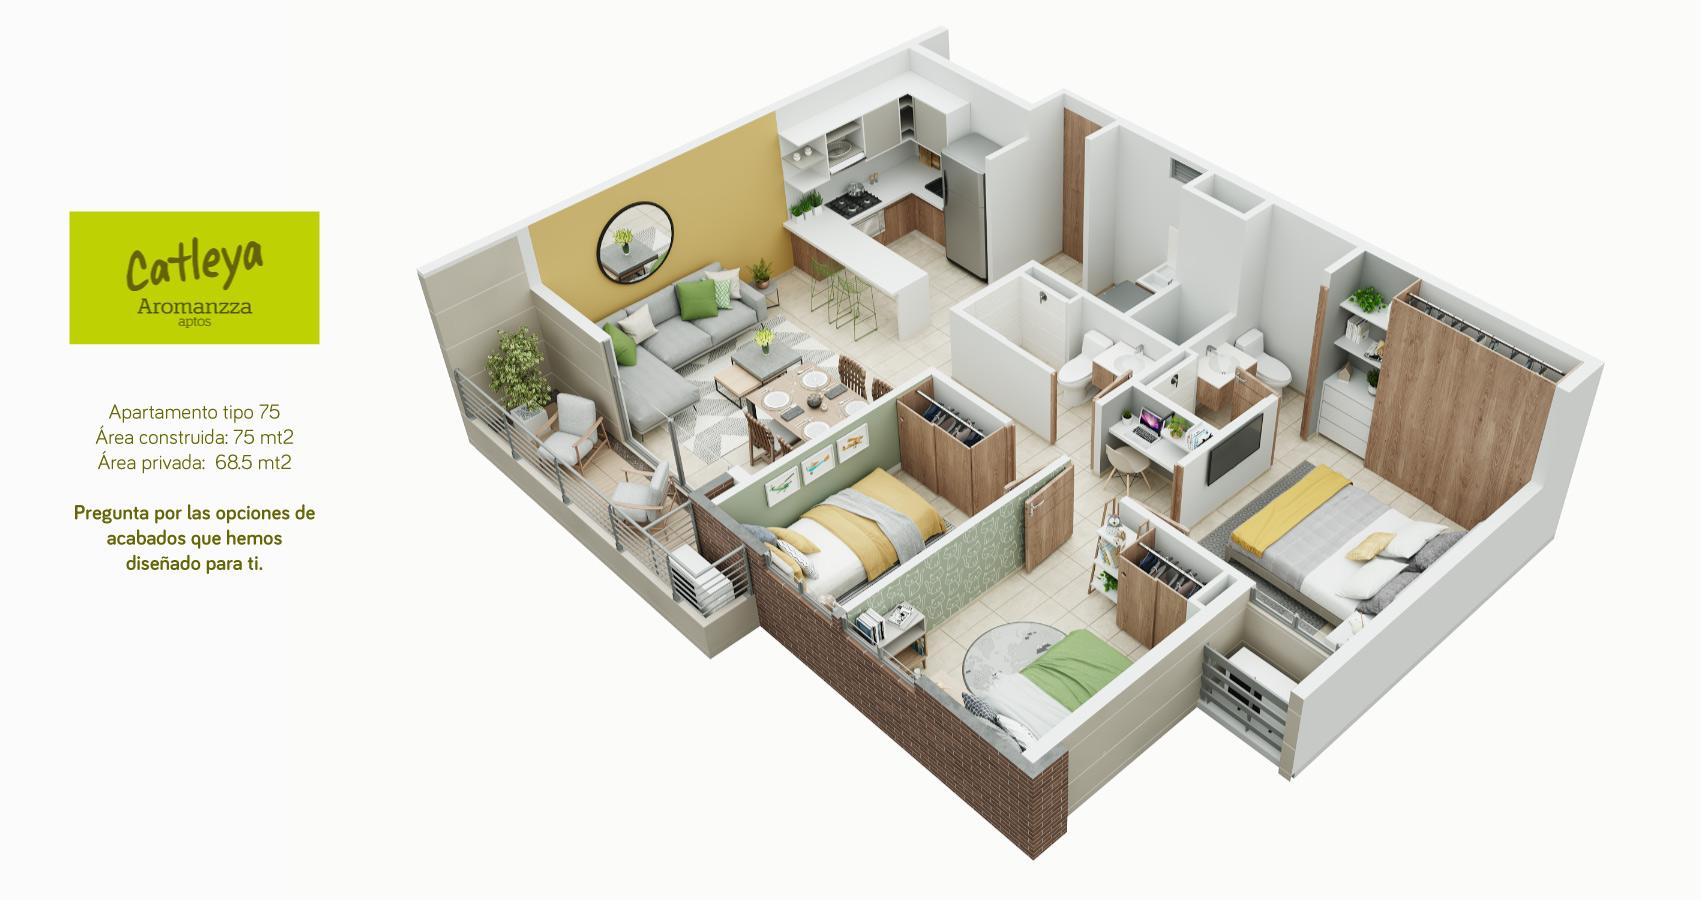 Apartamento tipo 75 Catleya - Aromanza